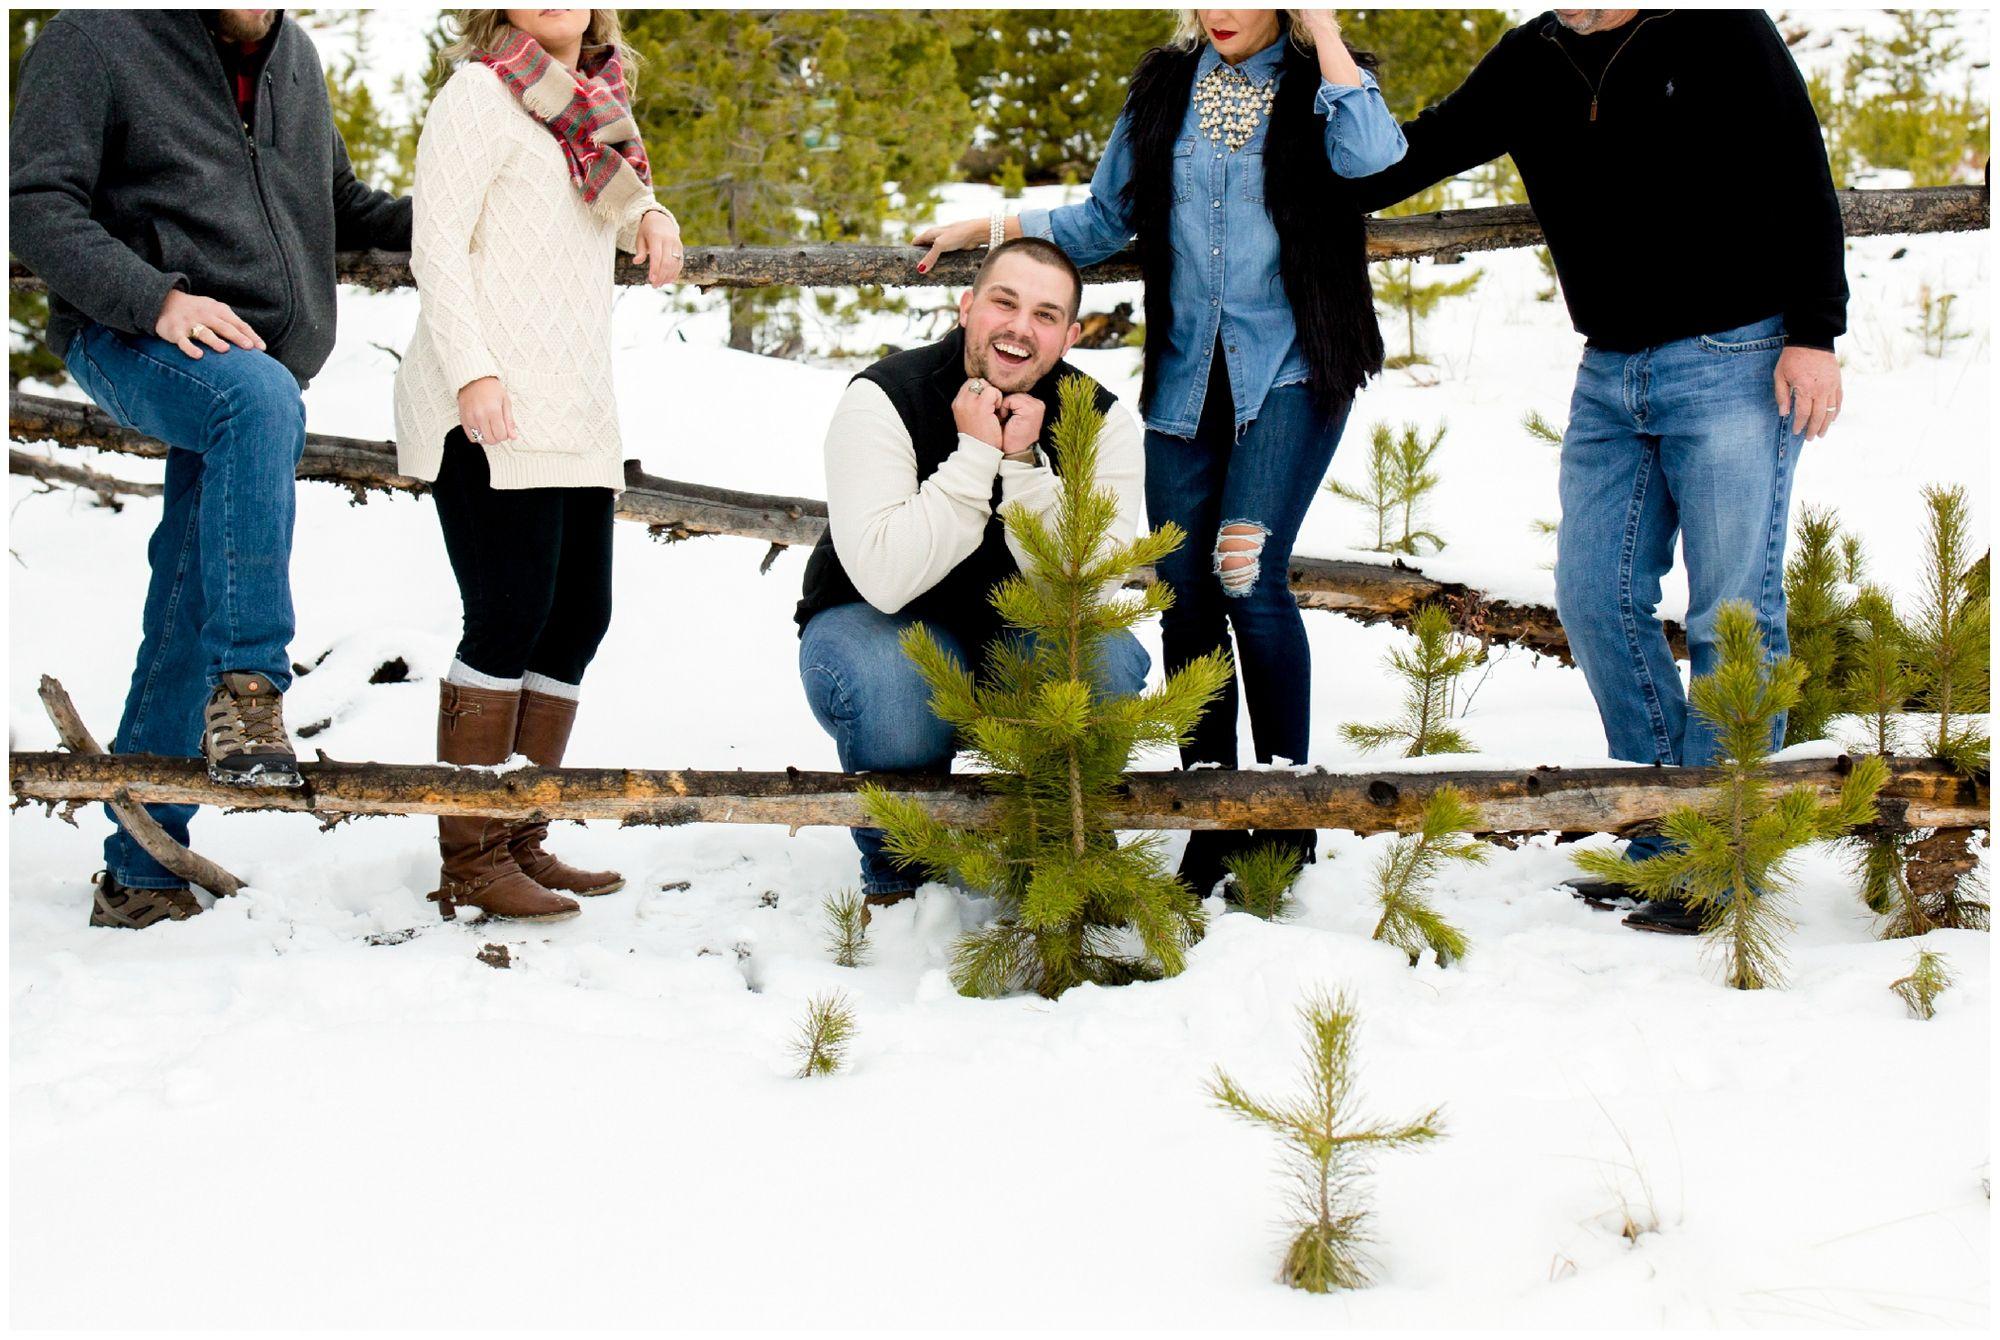 Breckenridge Family Photographers #winterfamilyphotography